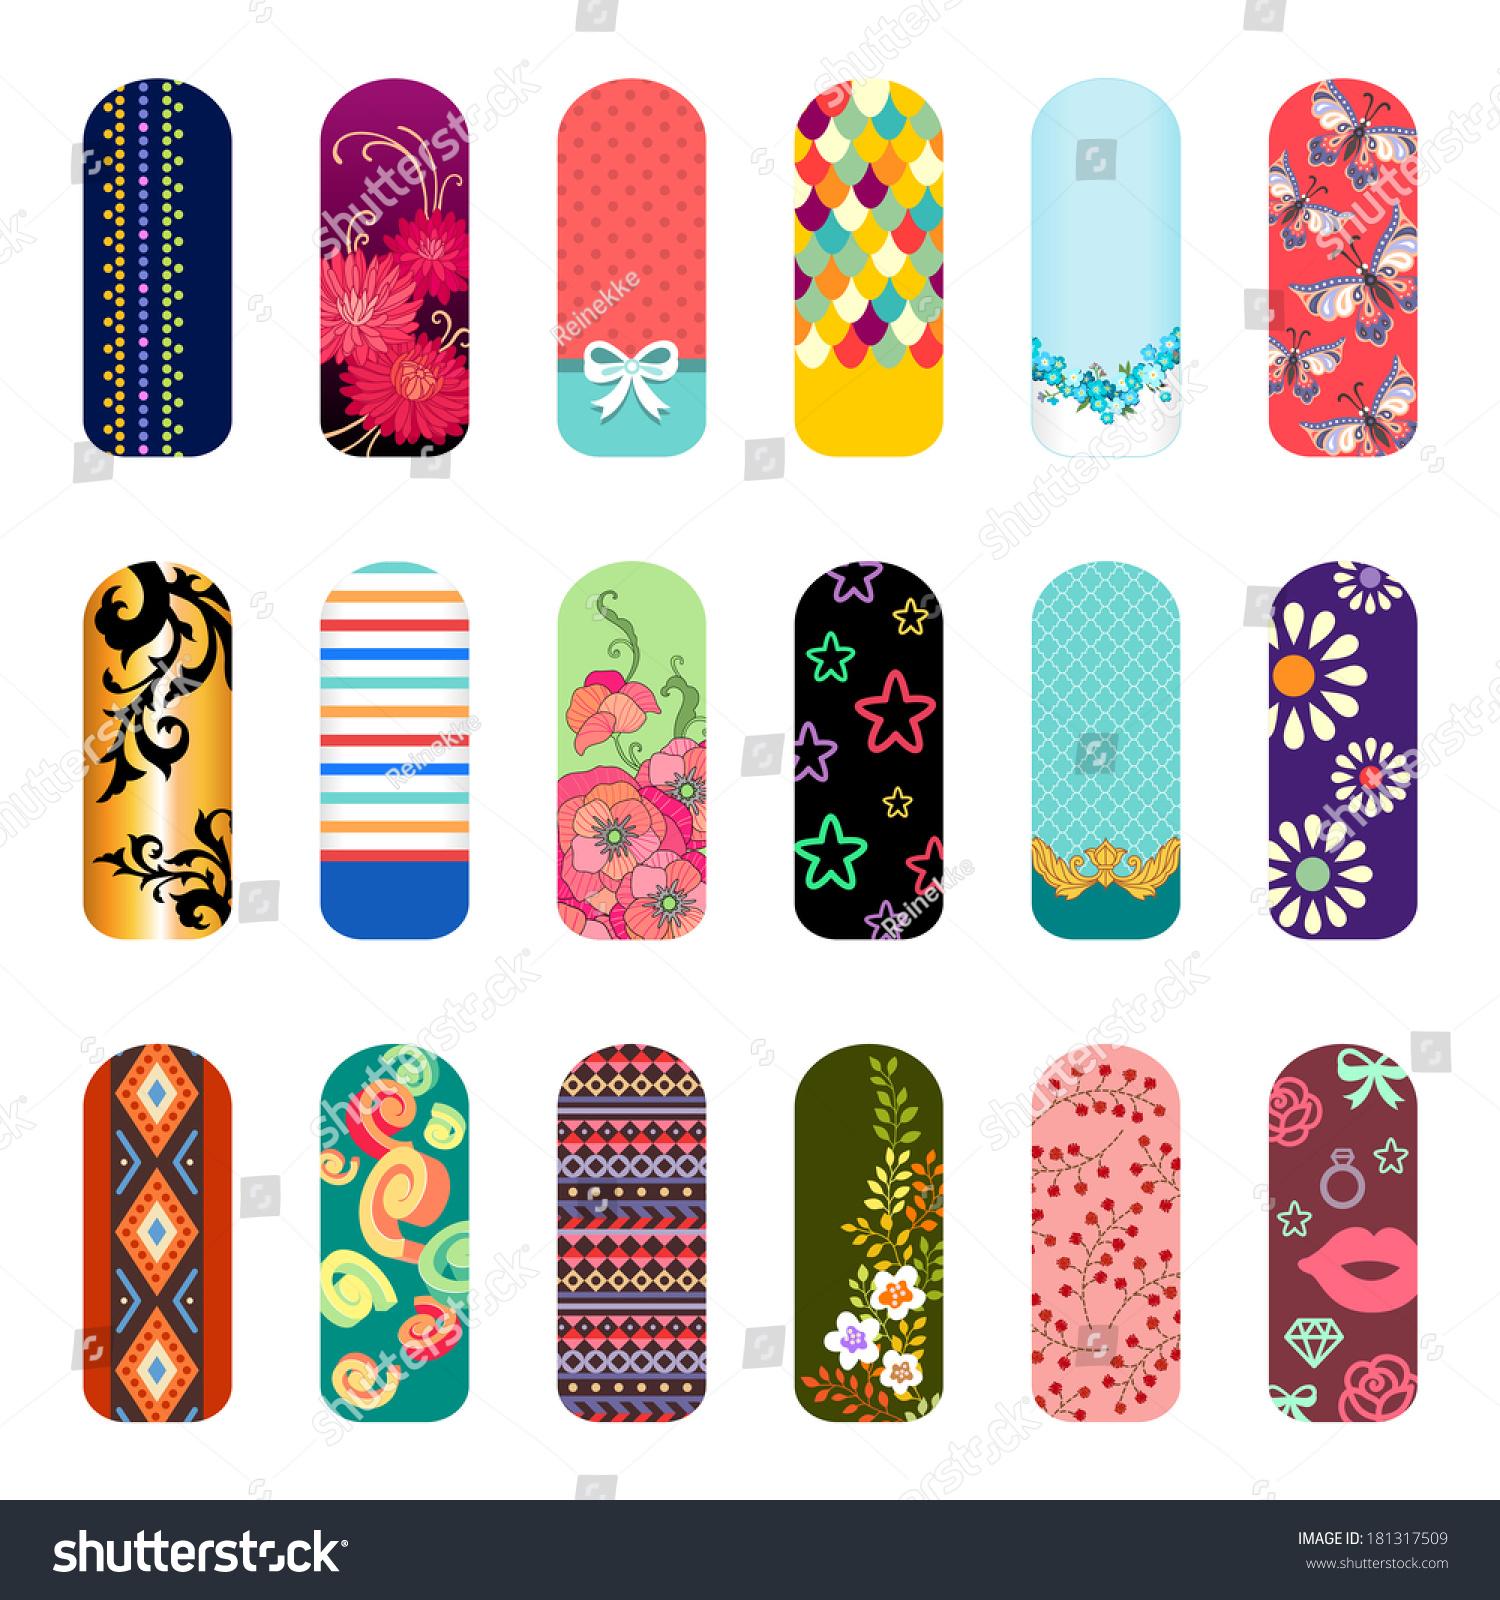 Set Fashion Nail Art Designs Beauty Stock Vector 181317509 ...